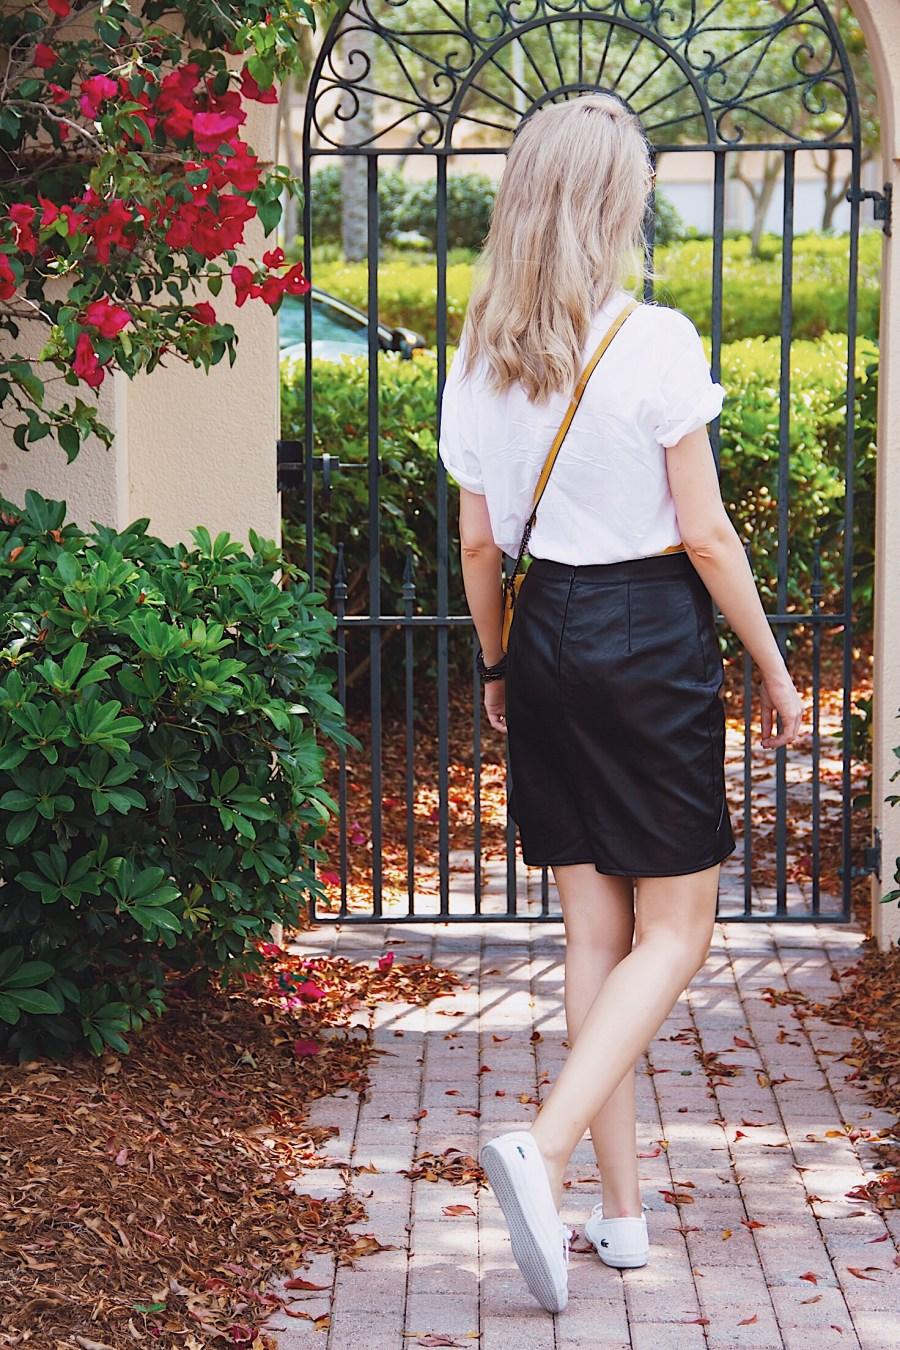 I am the Boss Graphic Tshirt Black ruffle skirt mustard bag white Lacoste sneakers